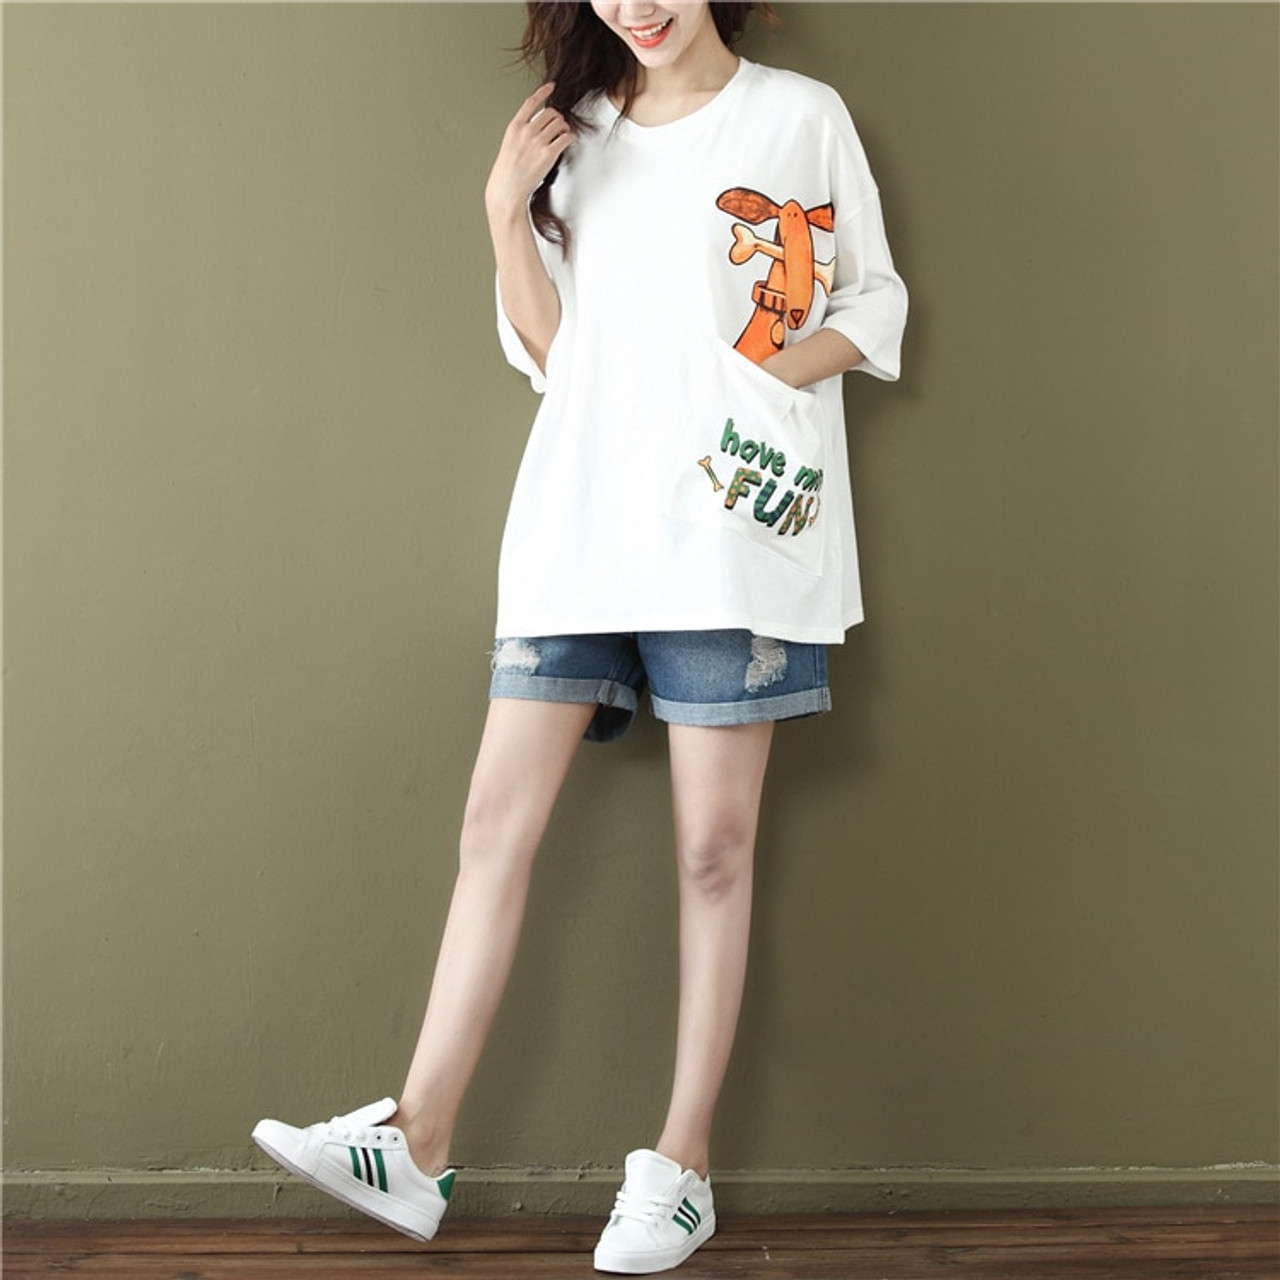 5d7ff680d8 2019 Summer New Arrival Short Sleeved Women T Shirt Plus Size Loose Korean  O Neck Cartoon Print Pocket White And Black Tee Tops